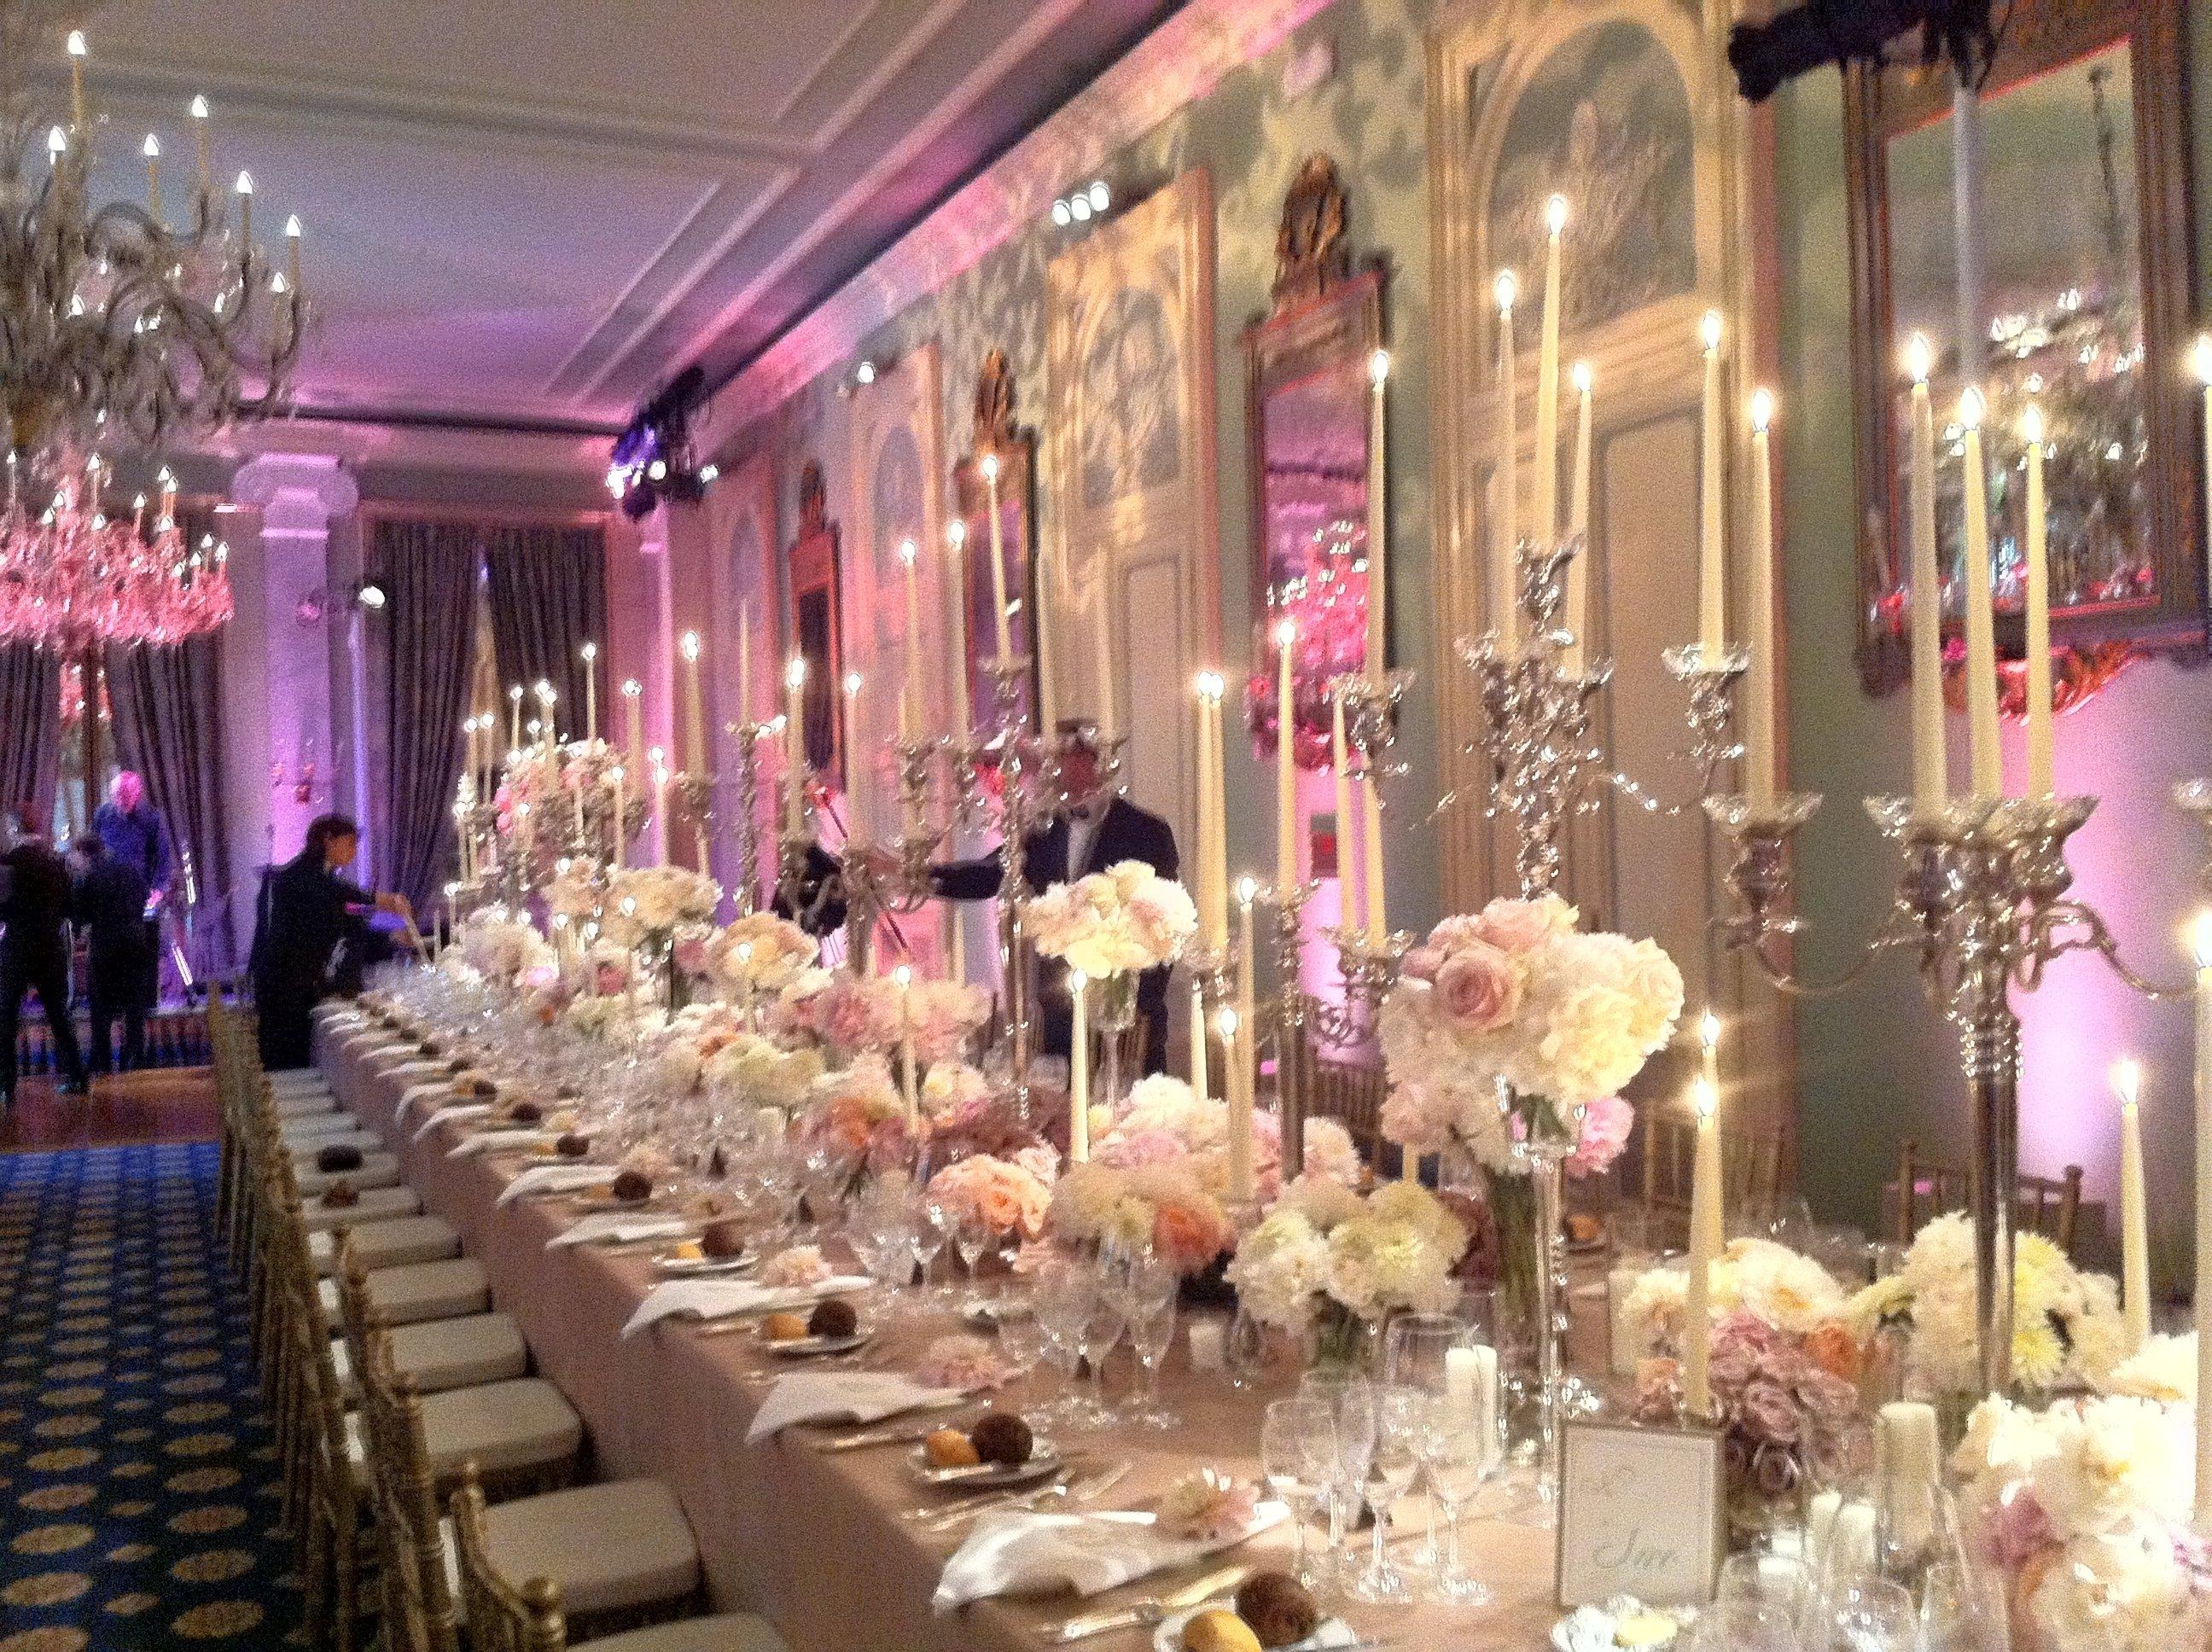 10 Ideal Wedding Ideas For Small Weddings attractive beautiful wedding reception ideas beautiful small wedding 2021